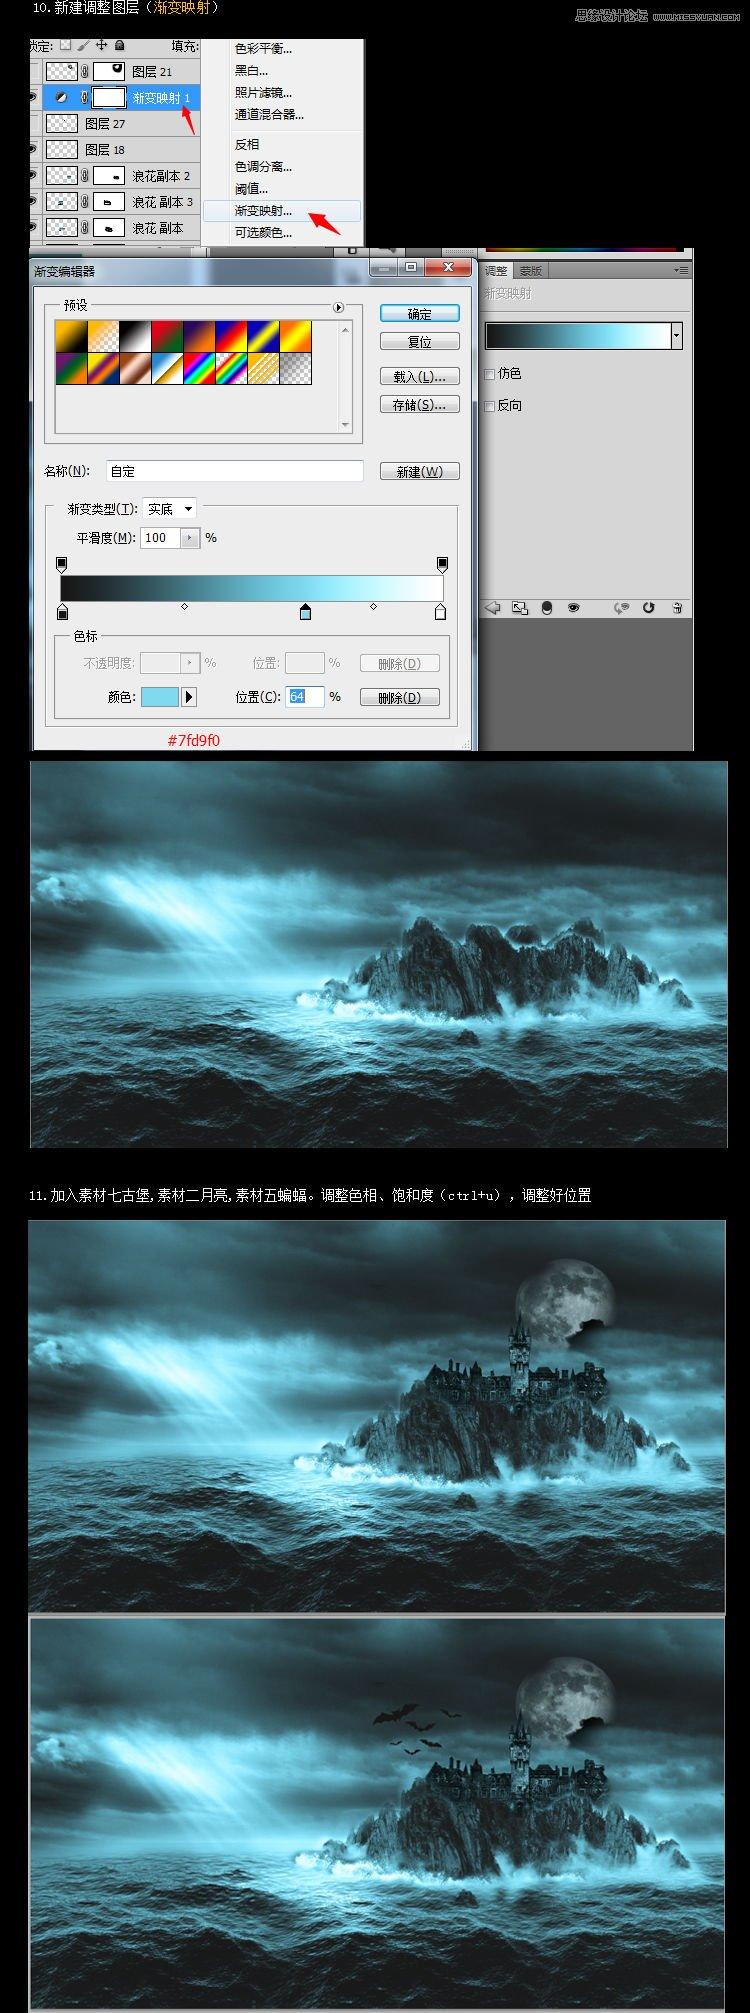 Photoshop合成恐怖氛围的海中孤岛场景5